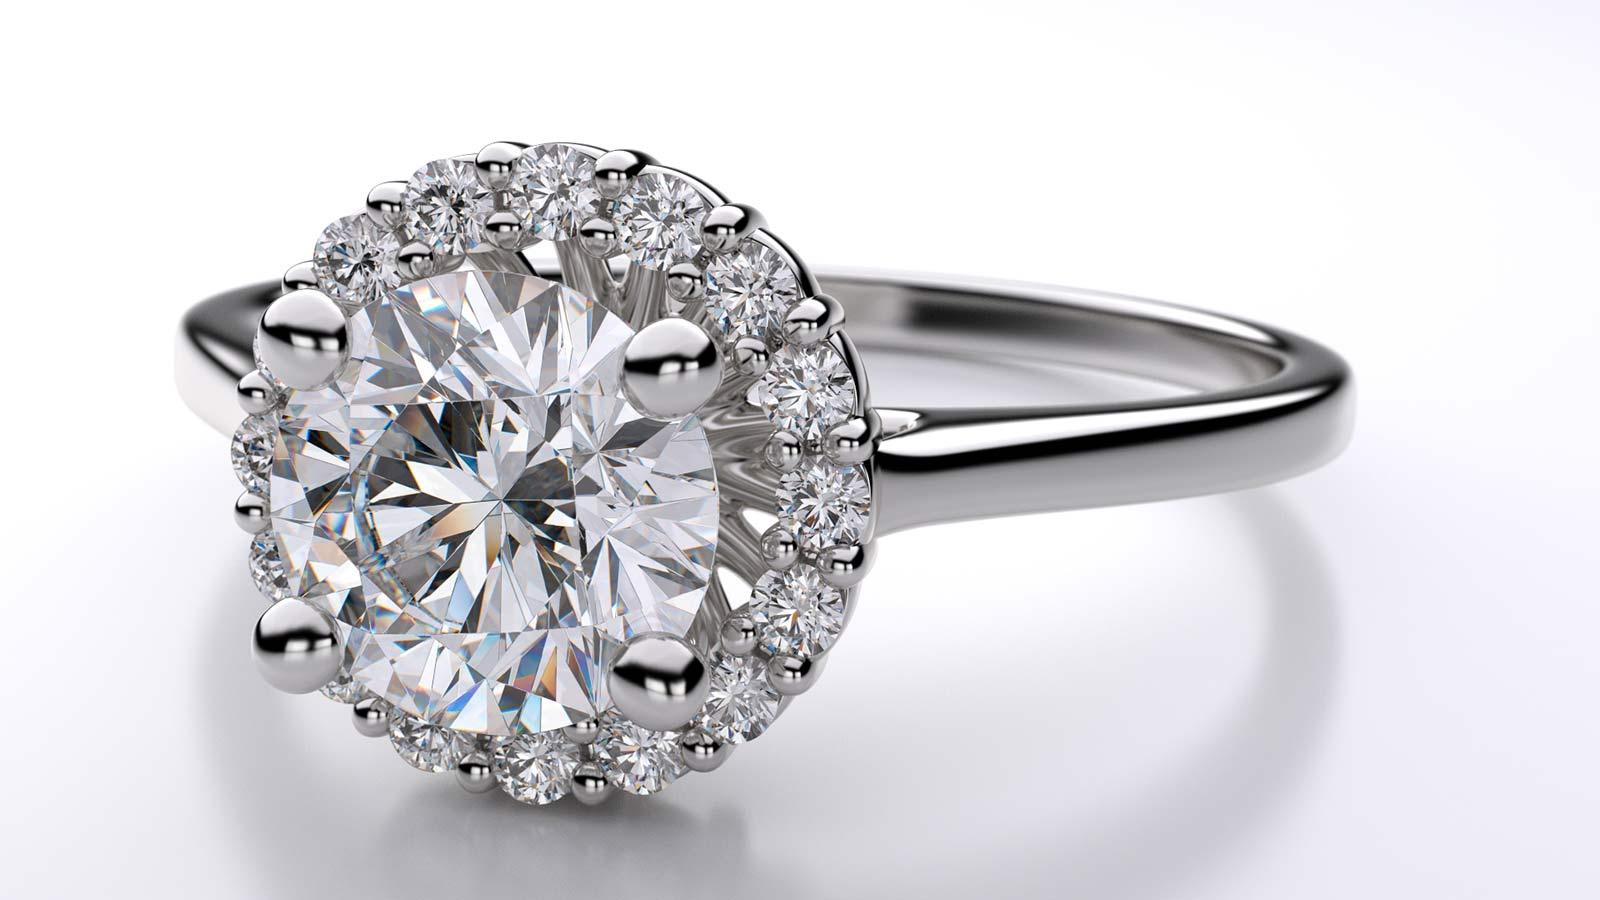 Diamond Jewelry High Definition Wallpaper   Zibrato 1600x900